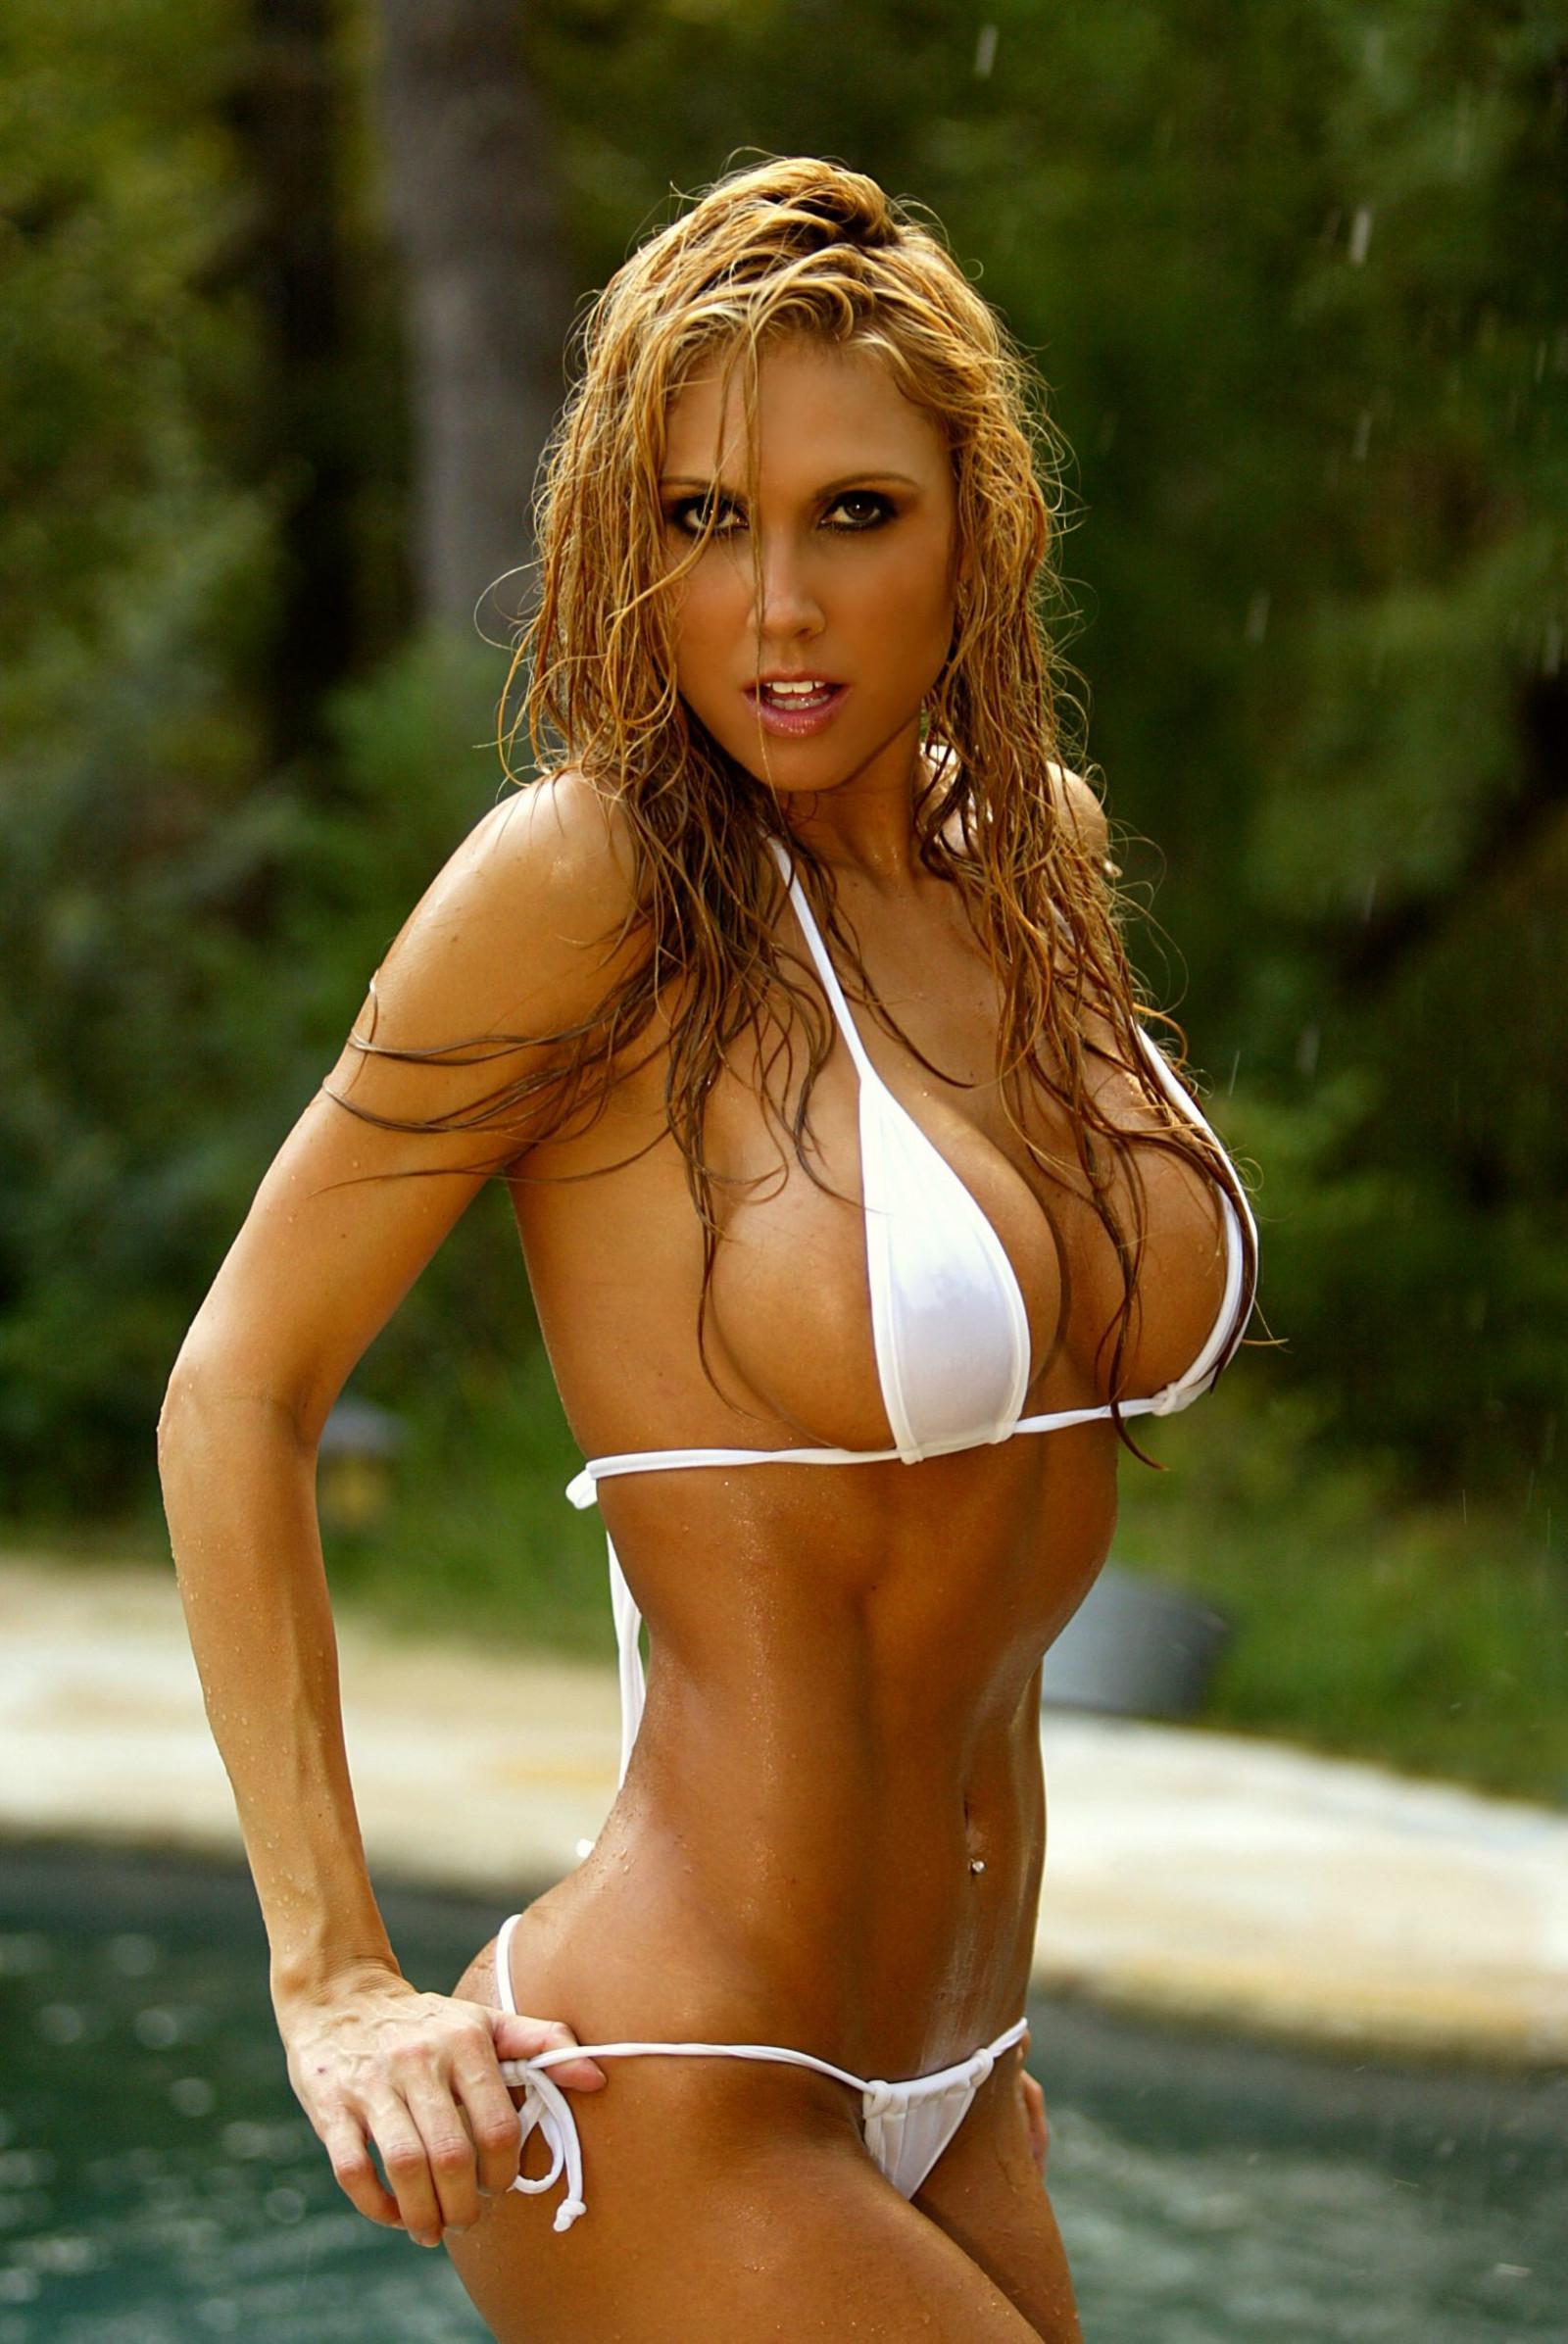 mobile-xxx-hot-nud-fitness-women-bikini-rojas